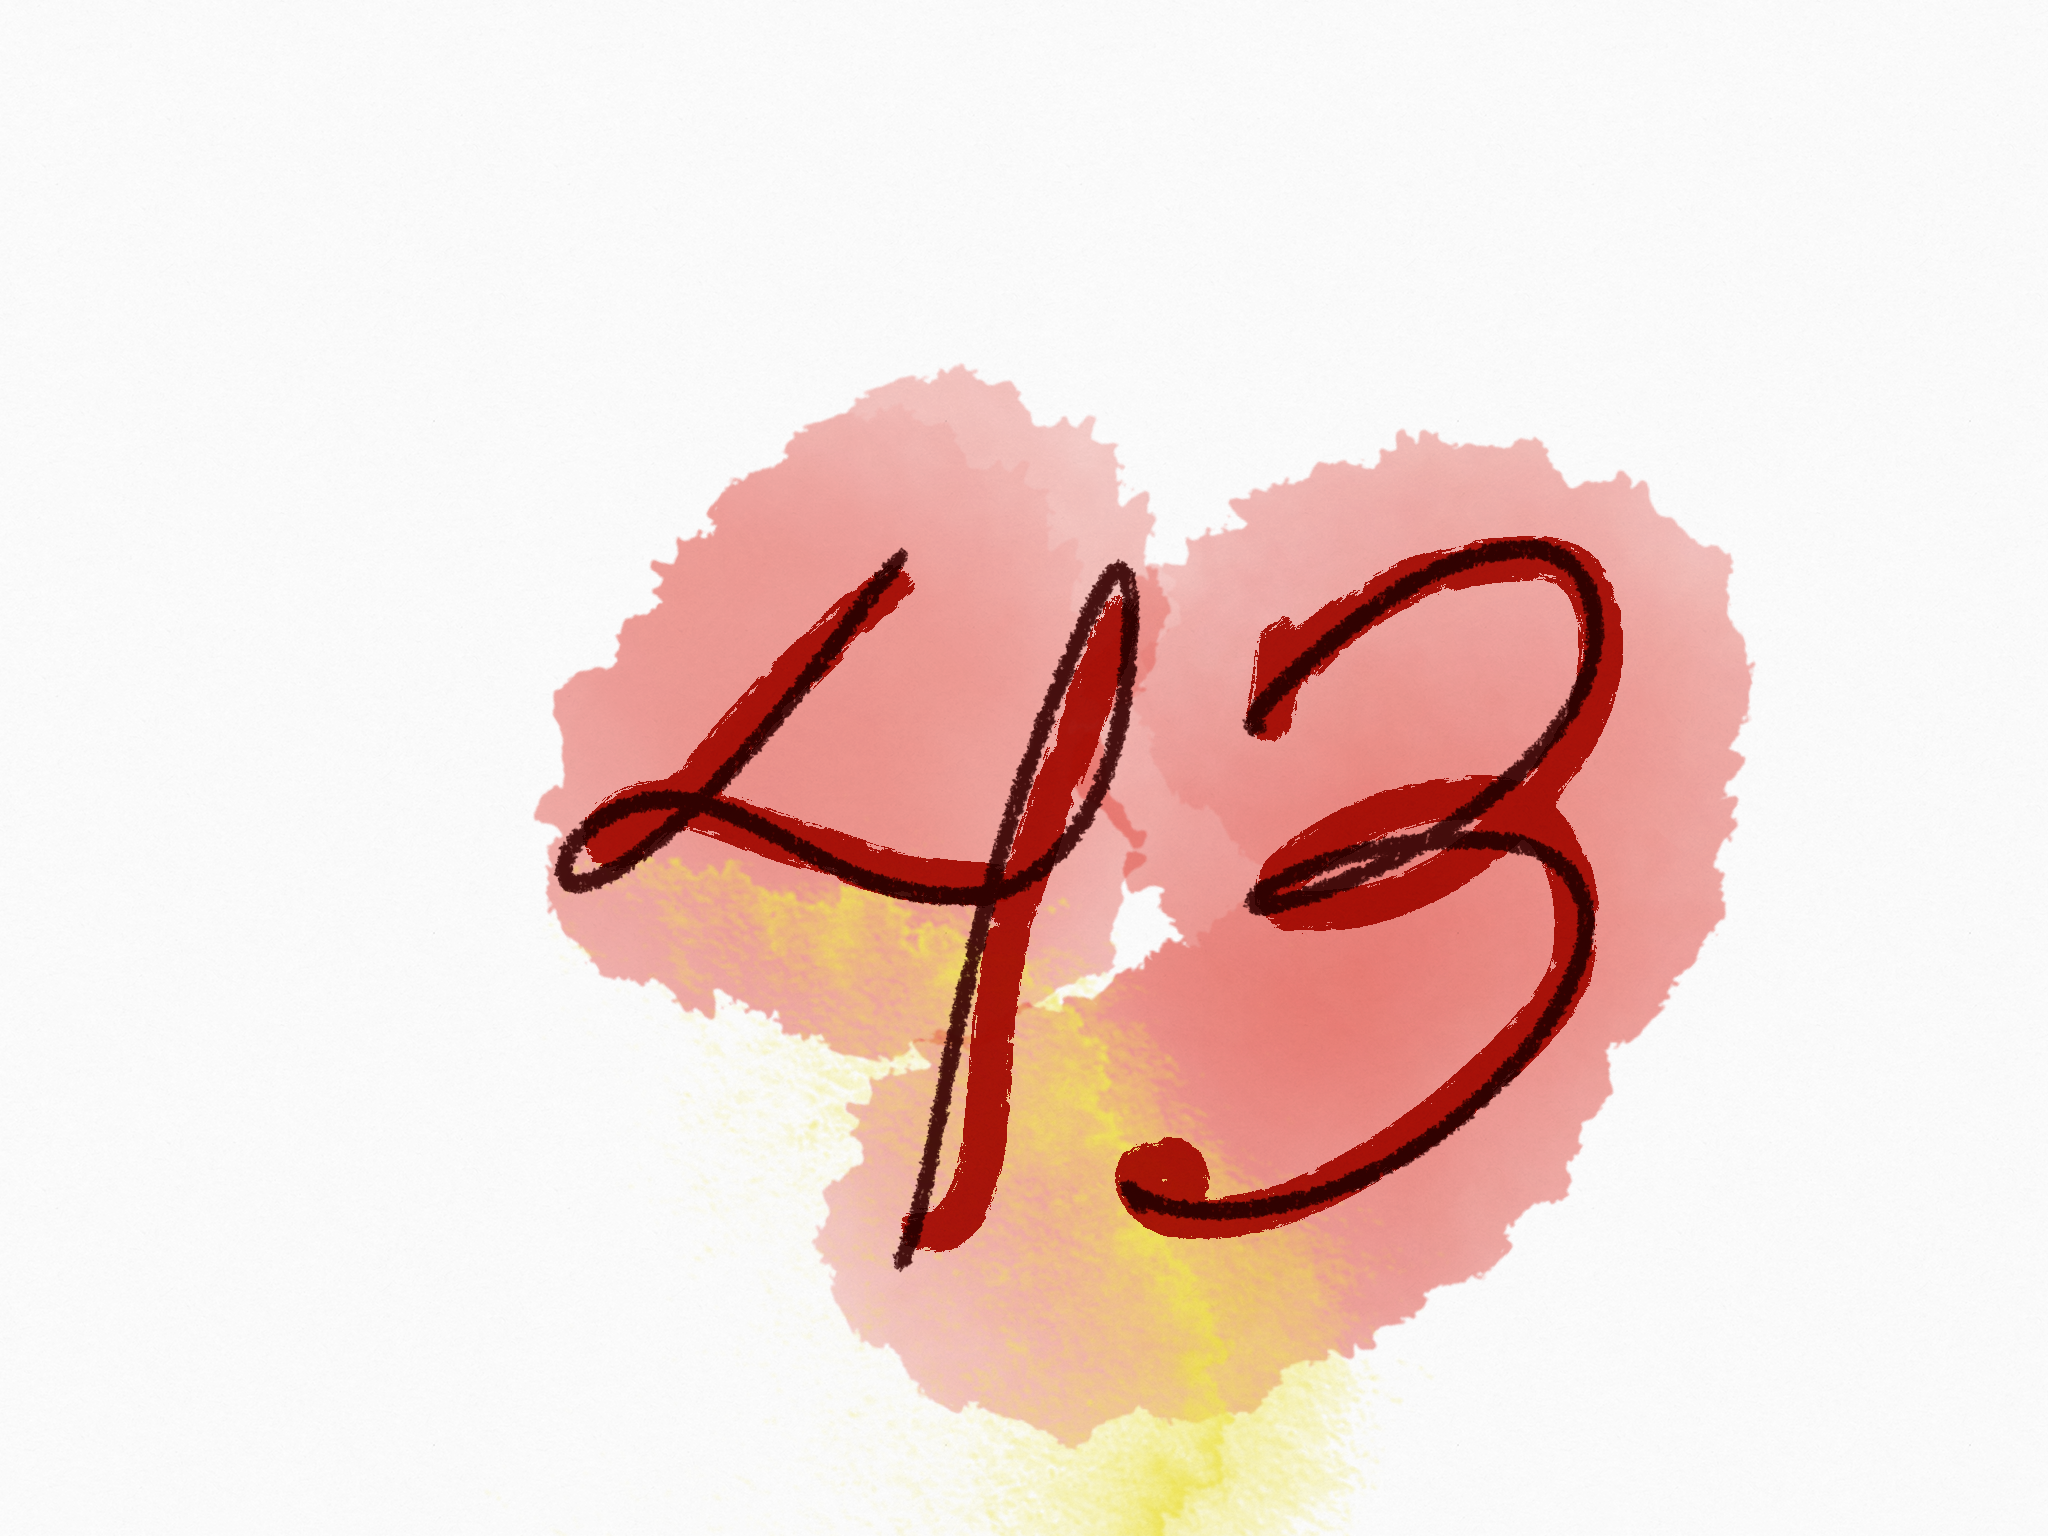 58CF8ABE-1115-401C-BFD4-78120B600E08